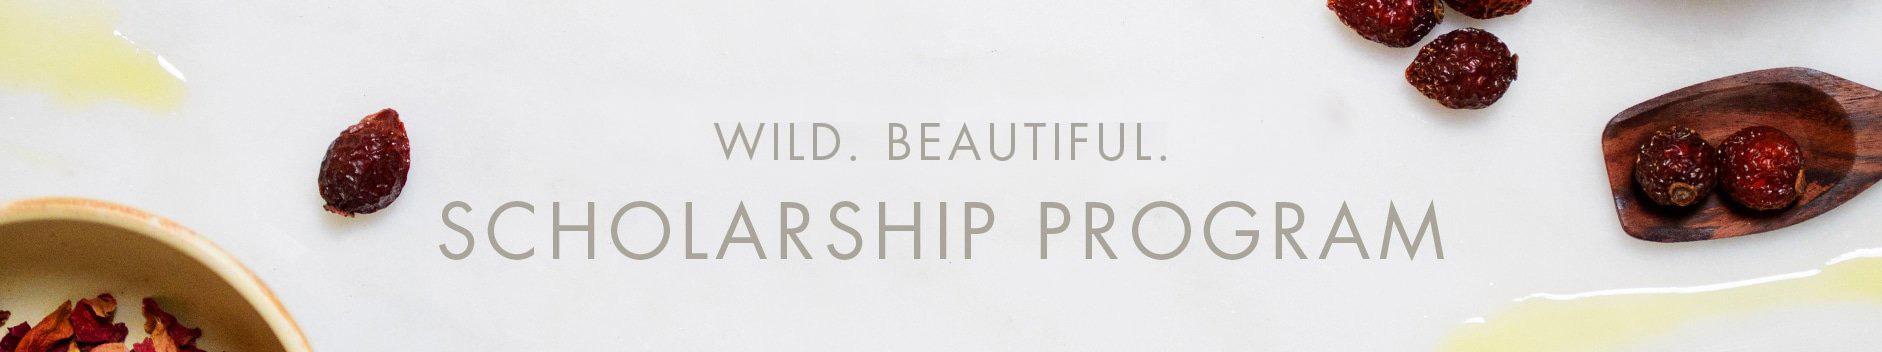 honest-wild-beautiful-scholarship-program